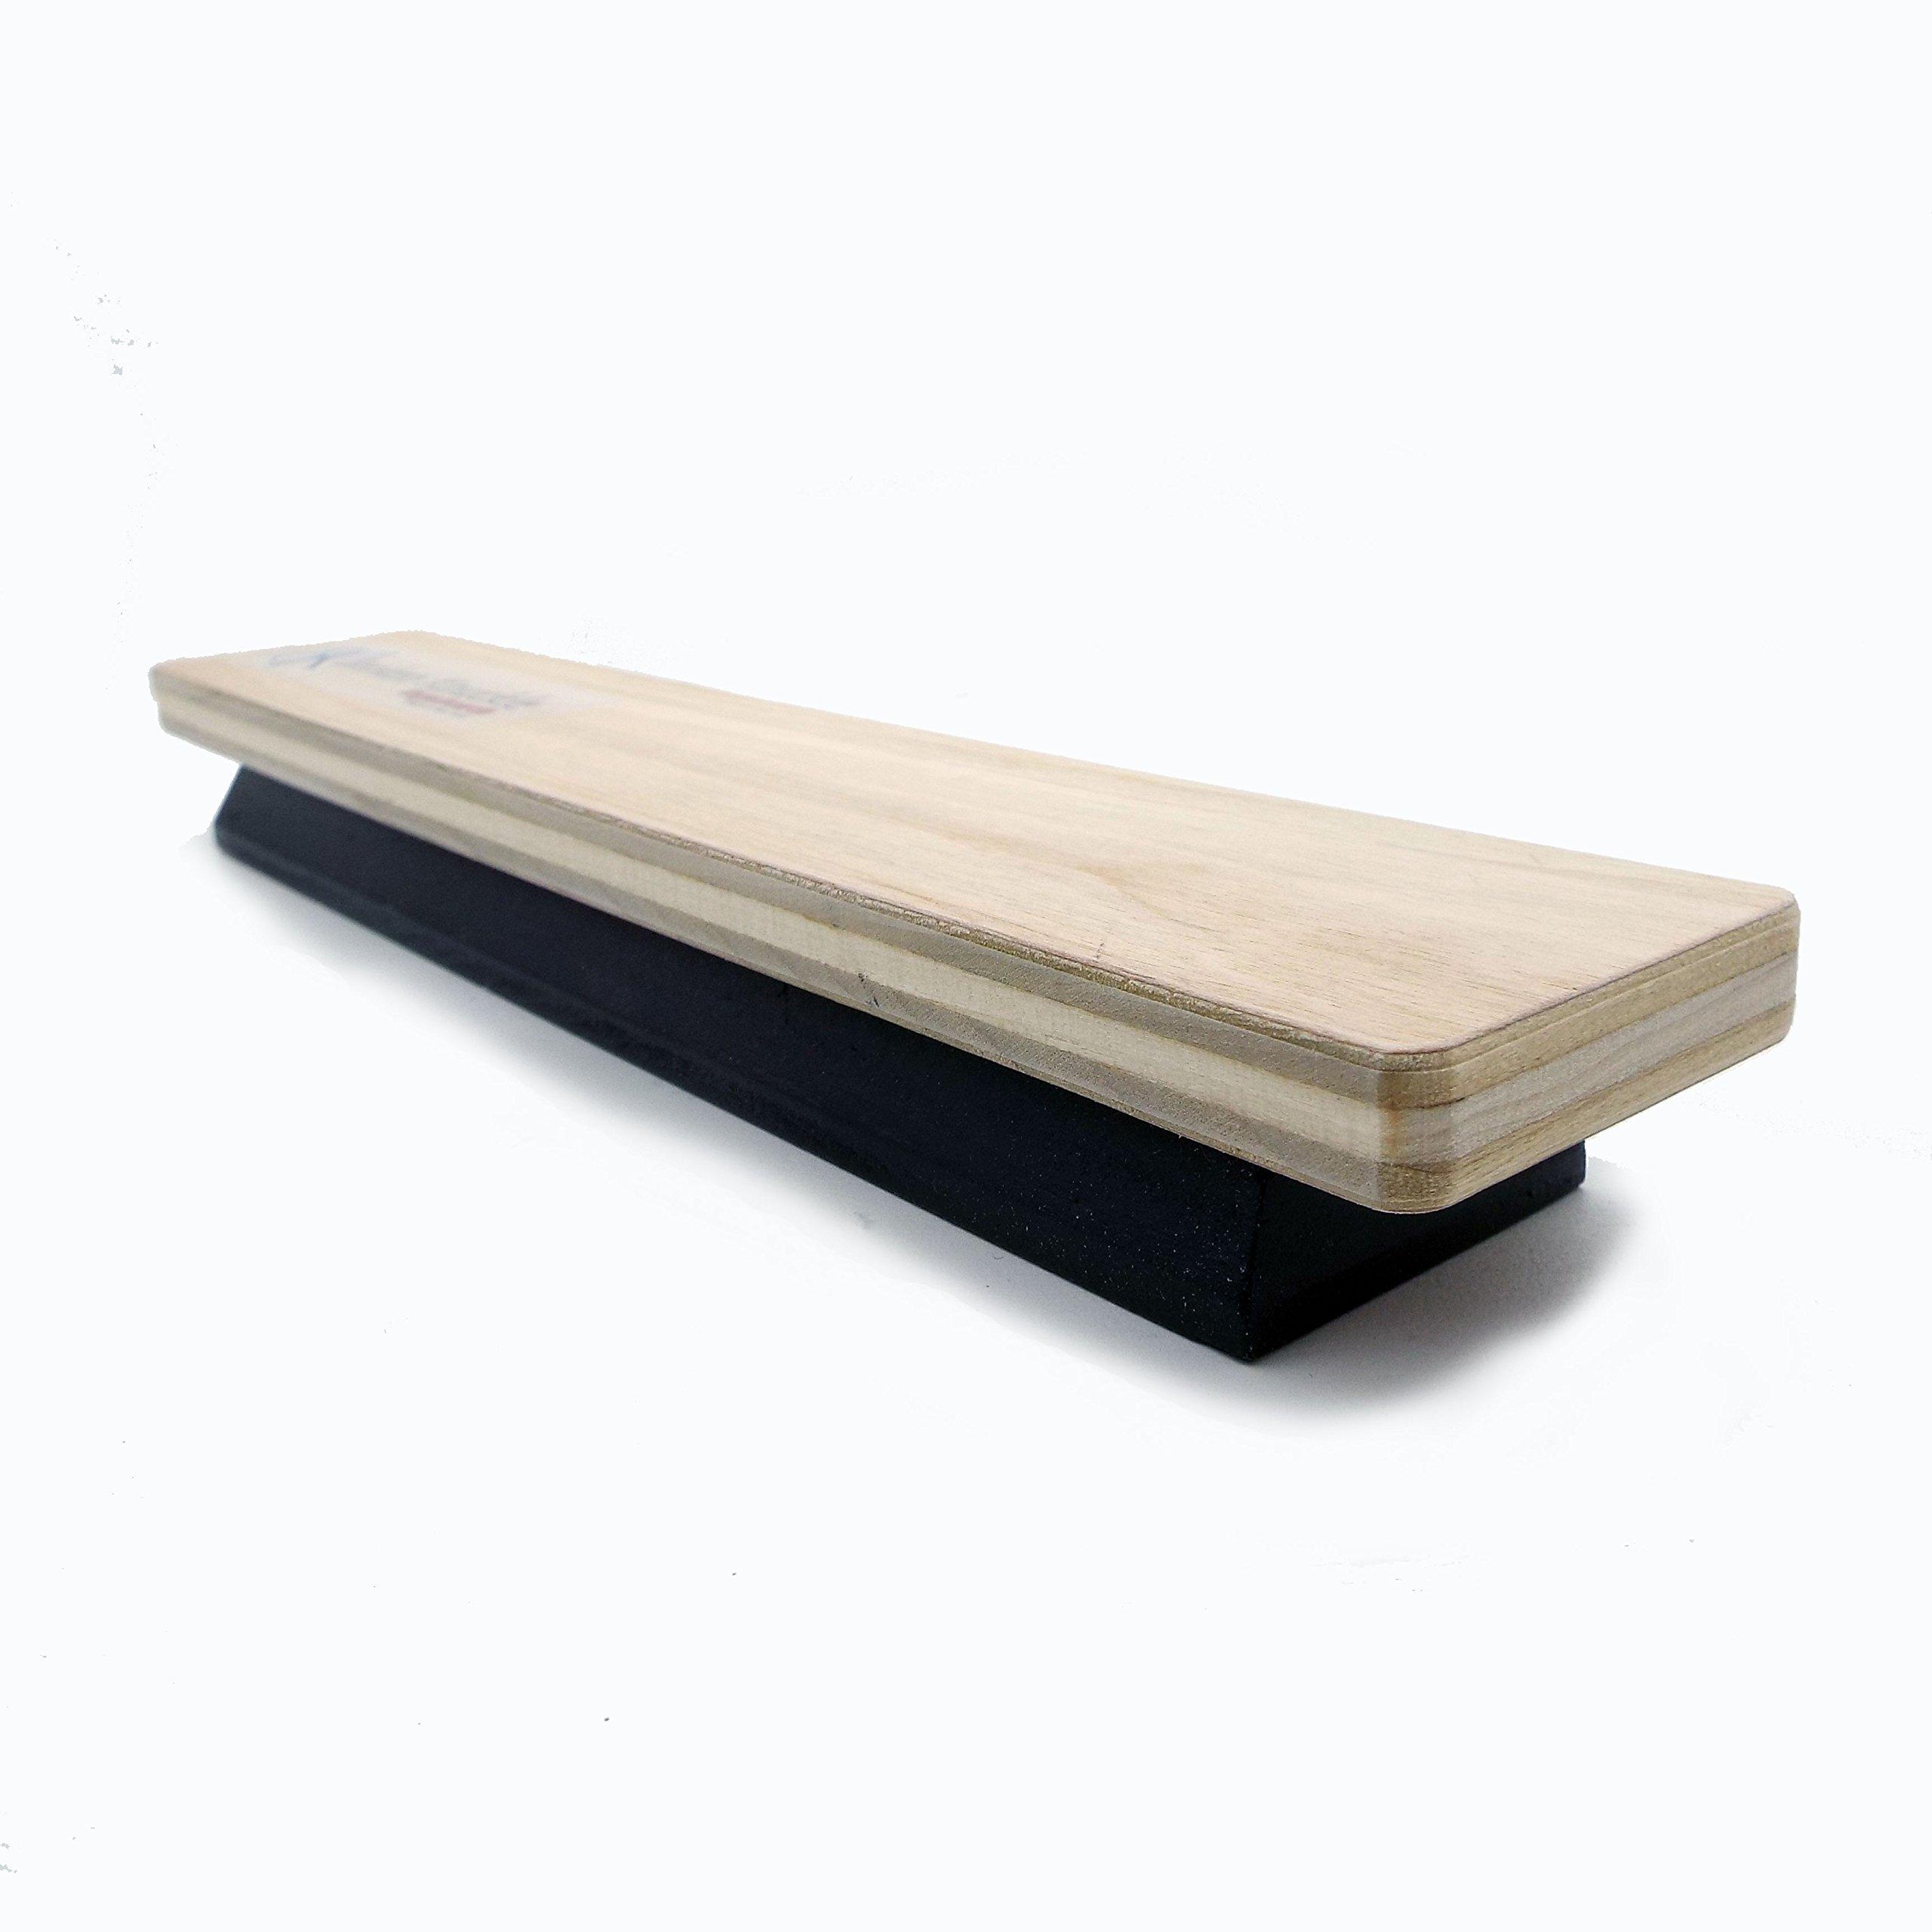 Broken Knuckle Fingerboards Basic Bench by Broken Knuckle Fingerboards